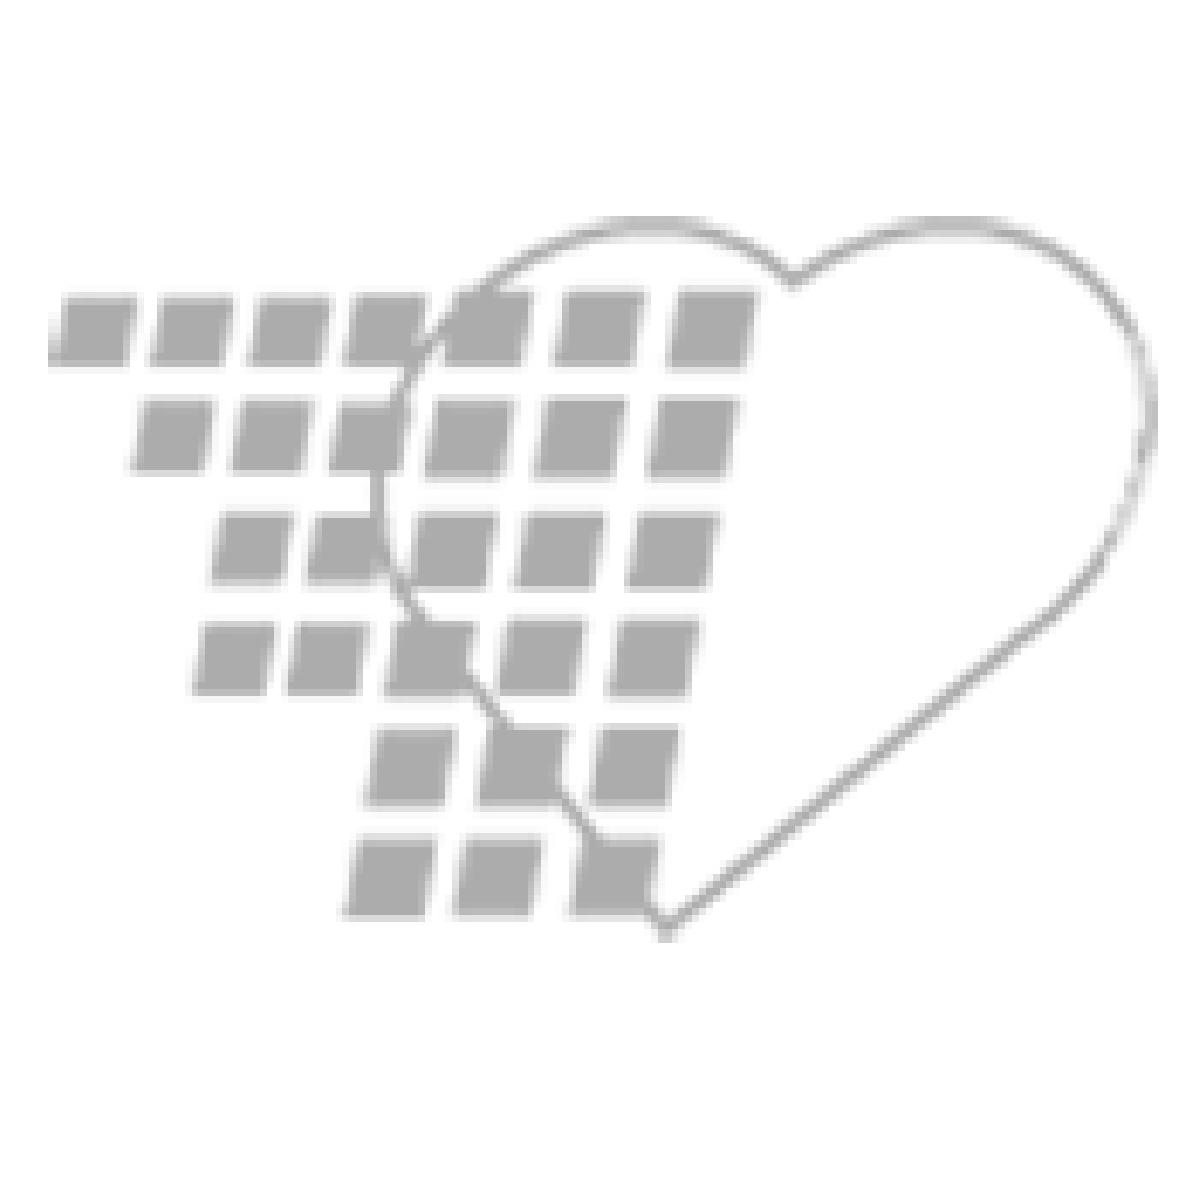 06-69-0994 - Stack & Connect Prescription Label Dispenser - 20 Roll Capacity